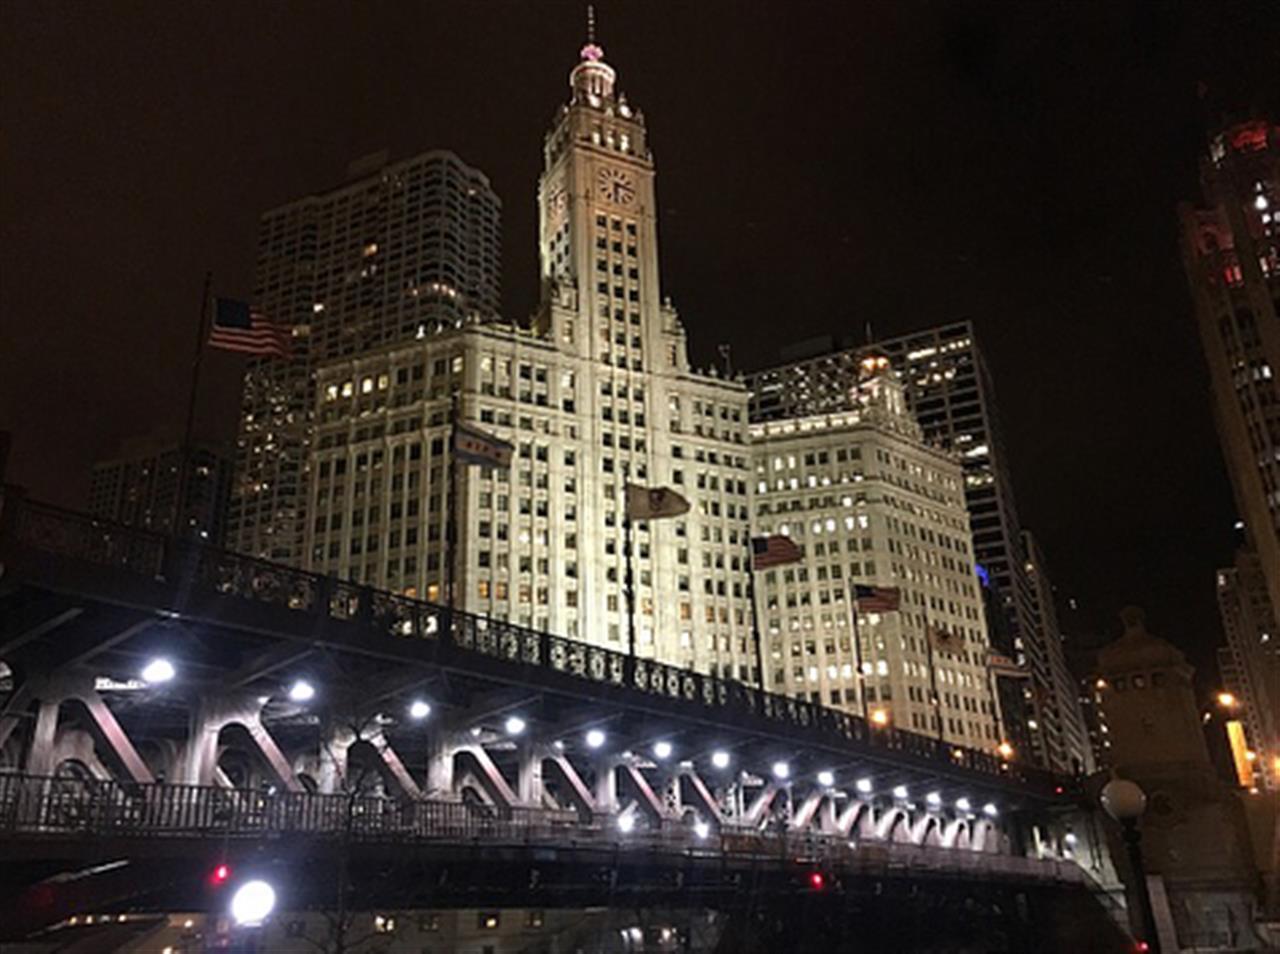 This weather, right? Perfect for an evening walk along the #ChicagoRiver #chicago #riverwalk #evening #wrigleybuilding #merchandisemart #bridge #architecturephotography #nightshot #leadingrelocal #bairdwarner